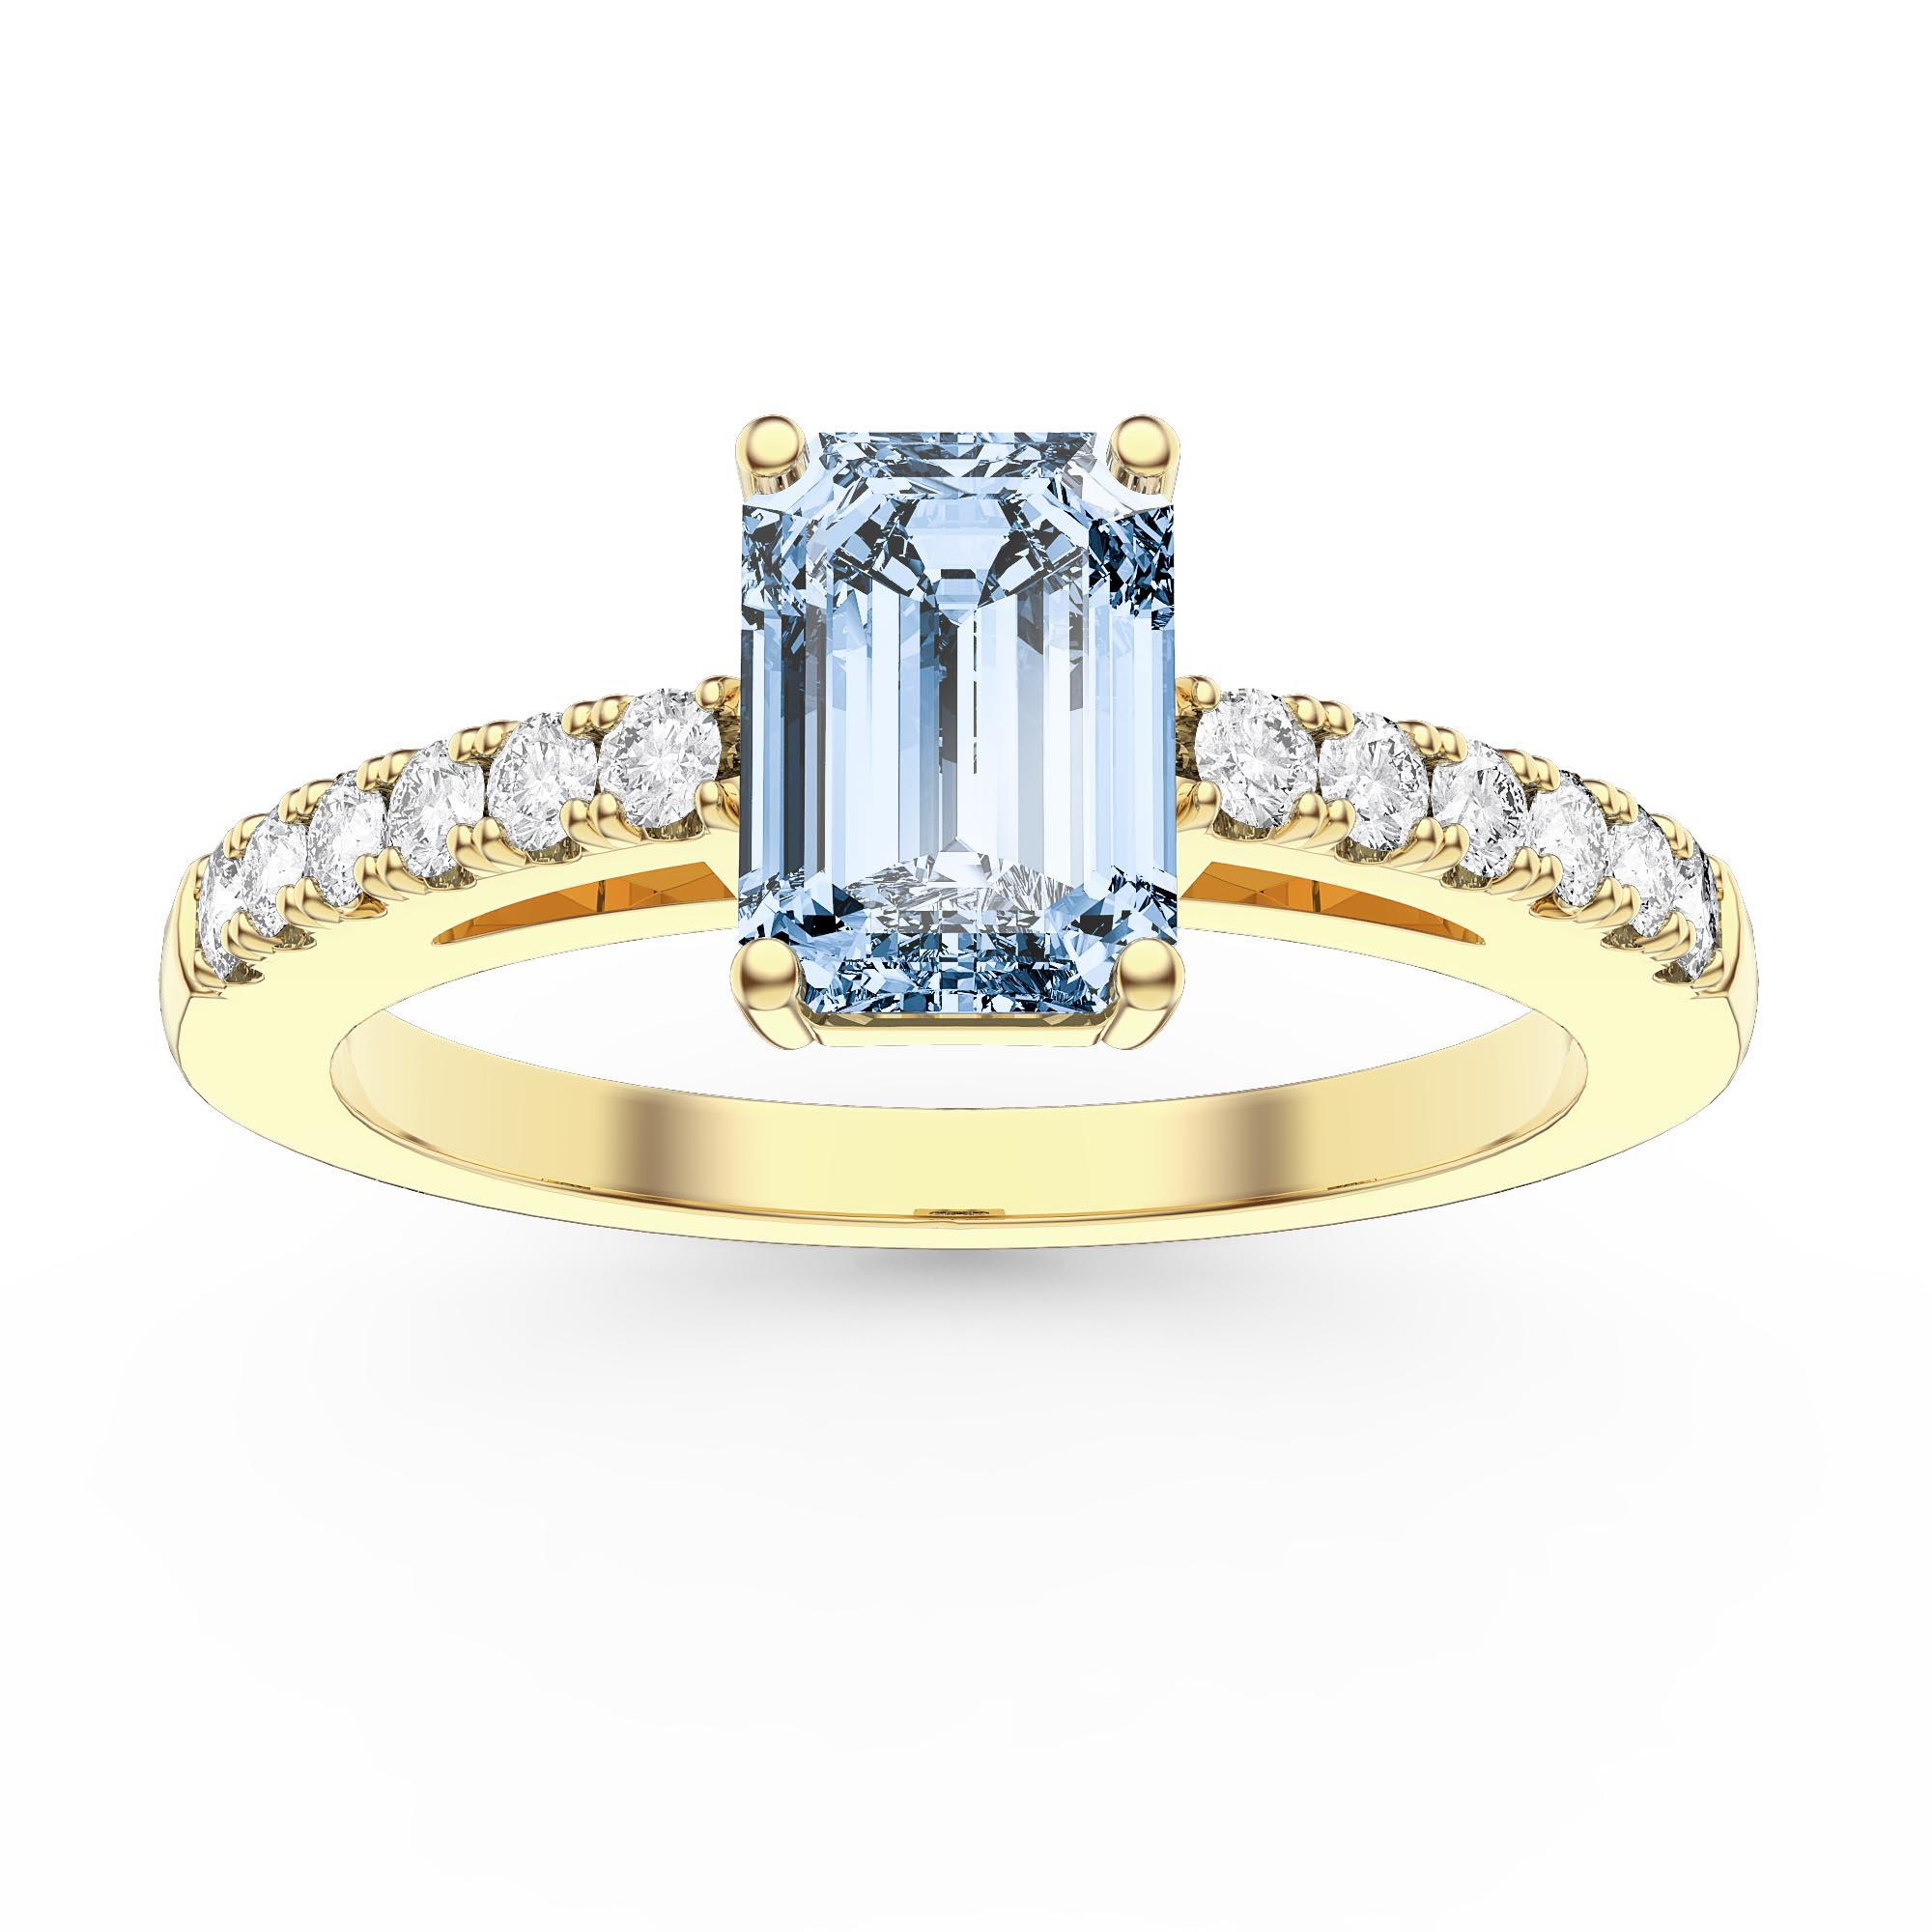 Unity 1ct Aquamarine Emerald Cut Moissanite Pave 18k Yellow Gold Engagement Ring Jian London 18k Gold Rings